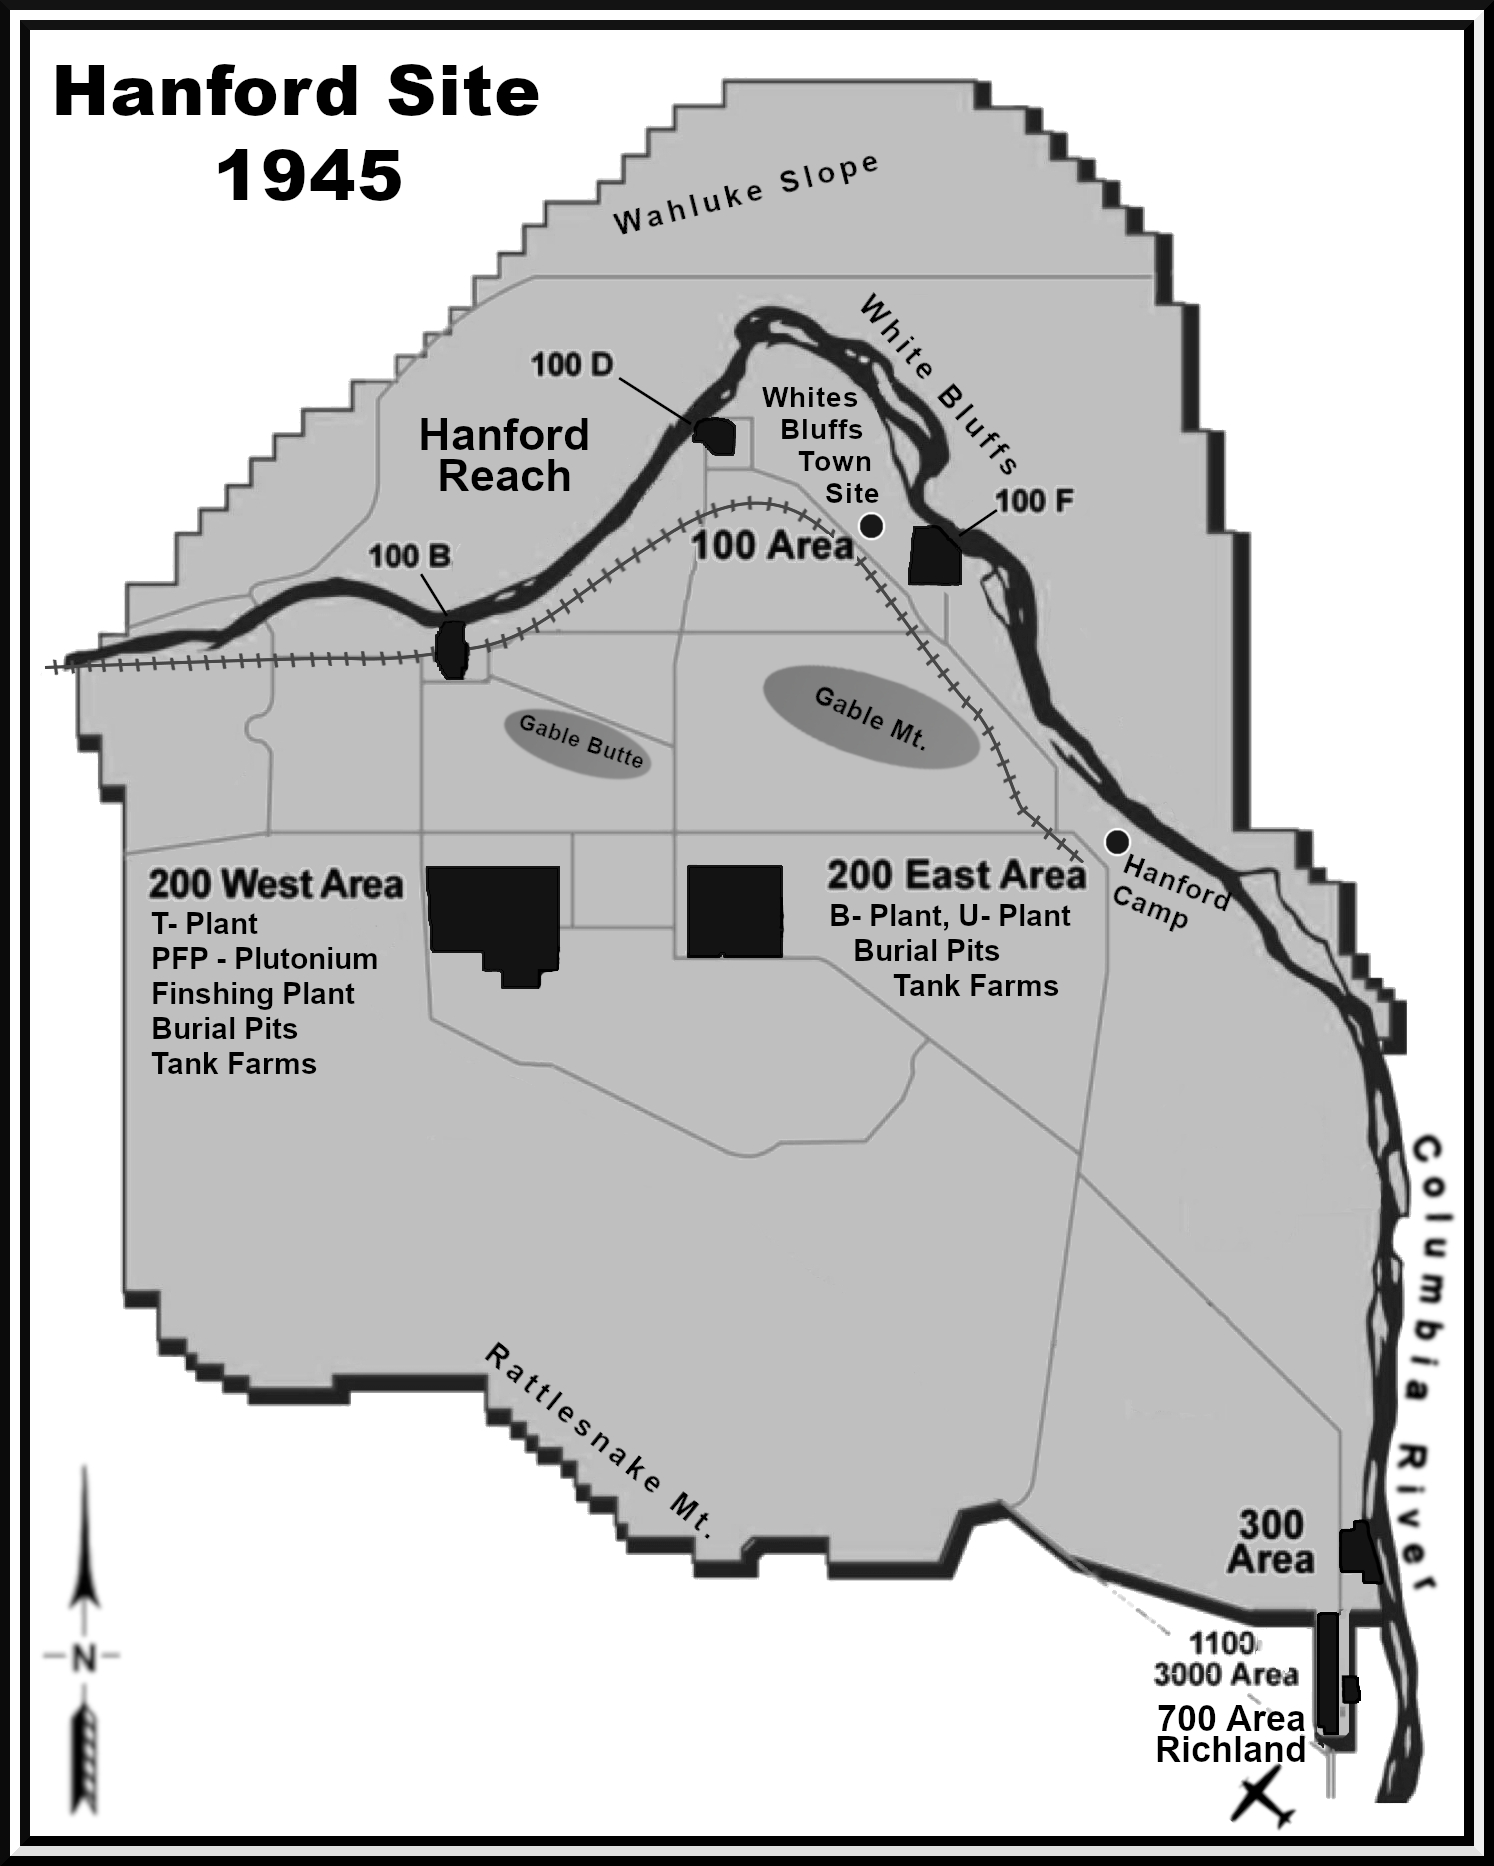 5.9-Hanford-Site-1945